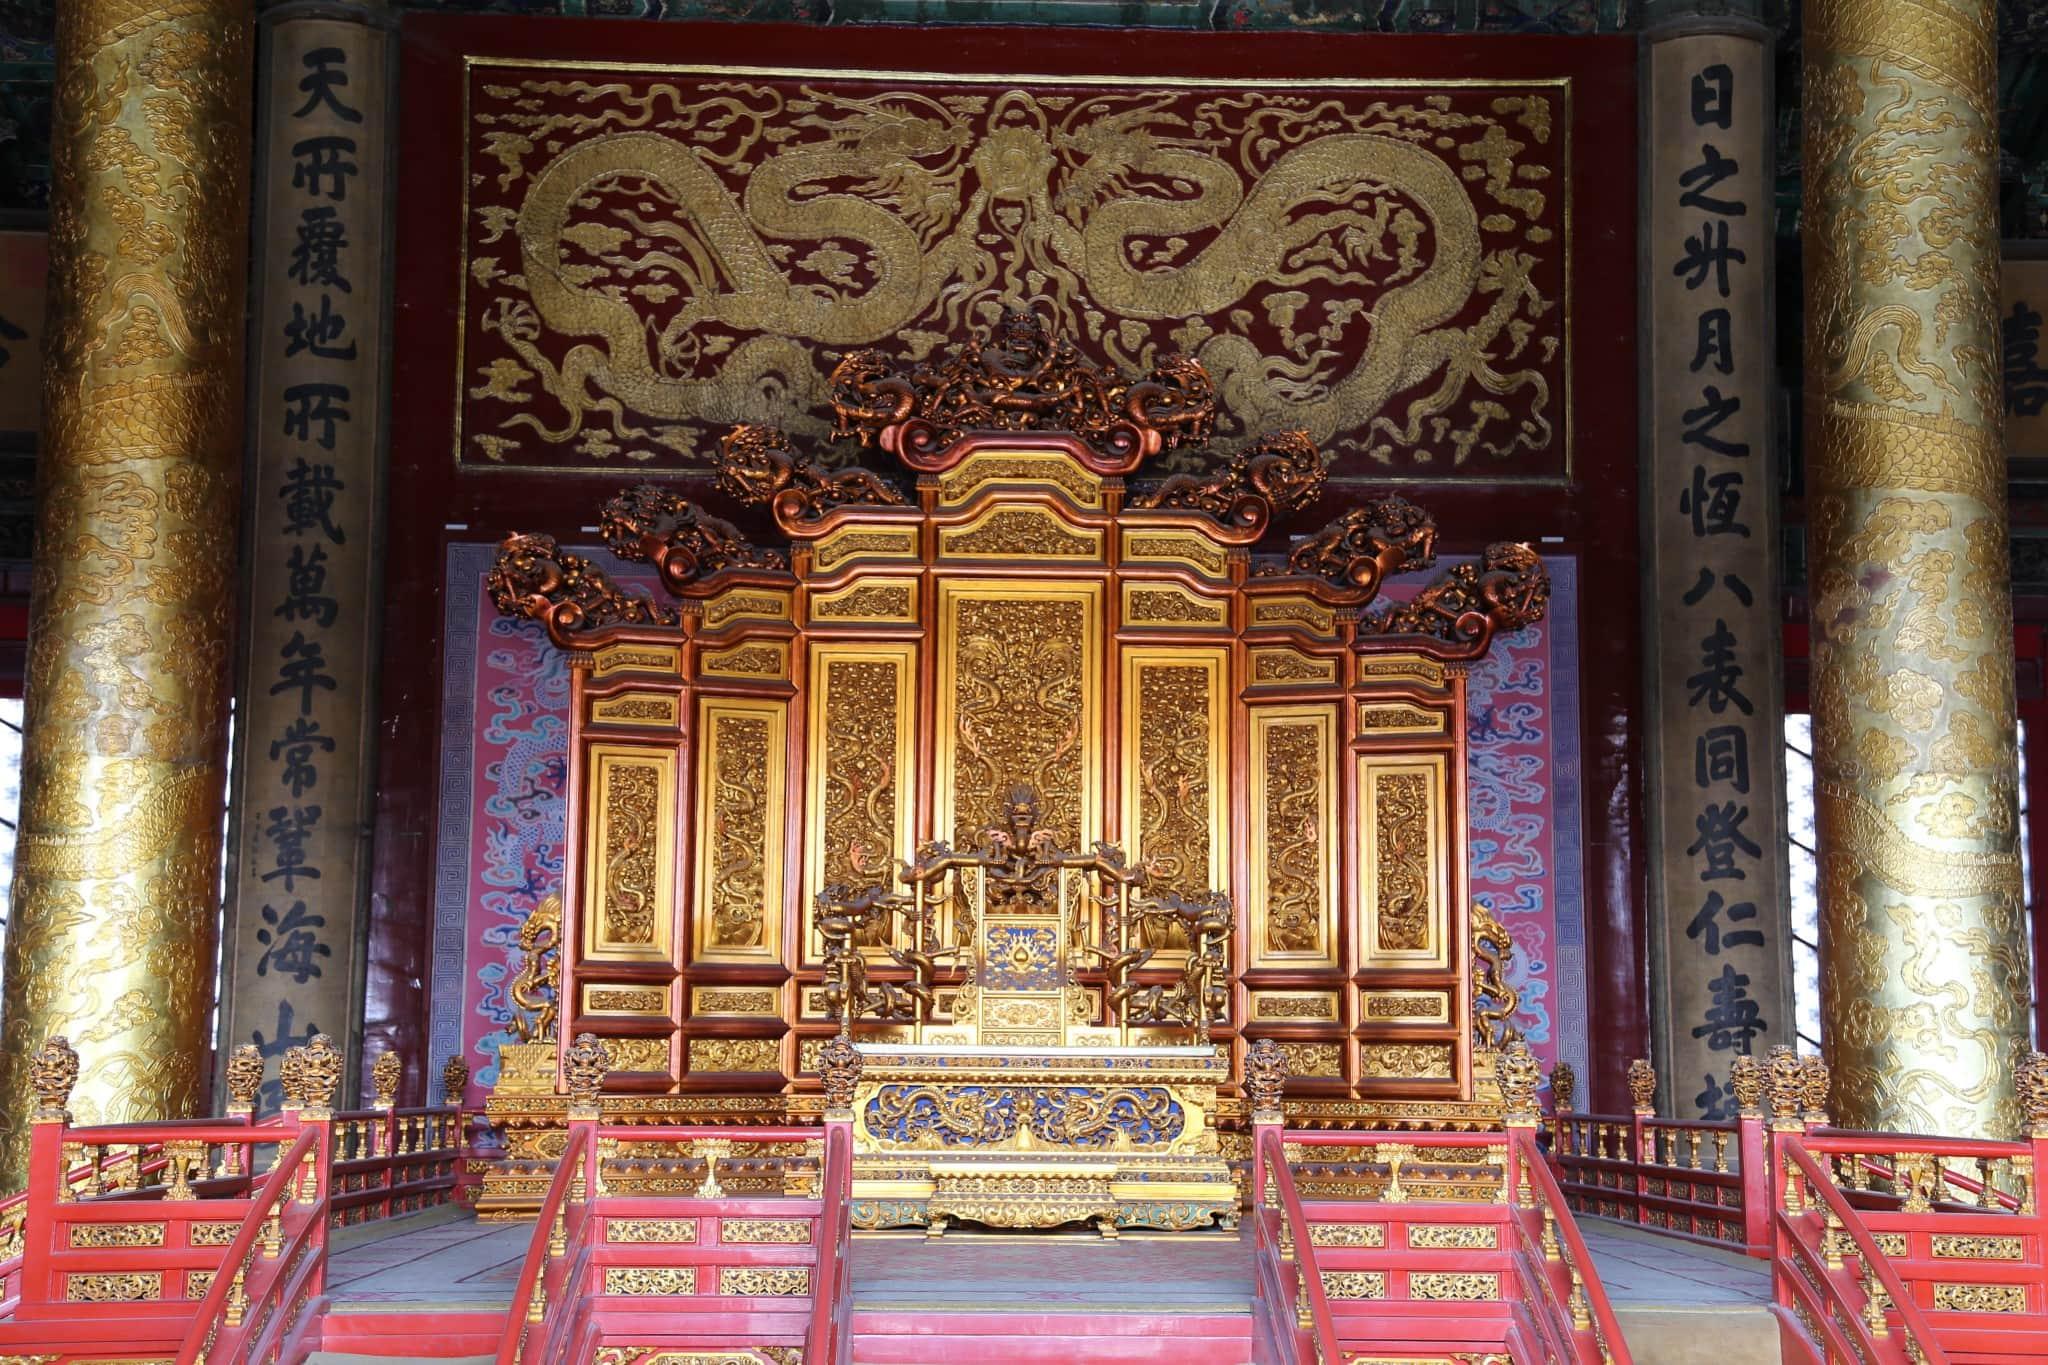 CHINA – Beijing (2014.04.17 – 2014.05.05) – Chris Travel Blog  |Imperial Palace Forbidden City Beijing China